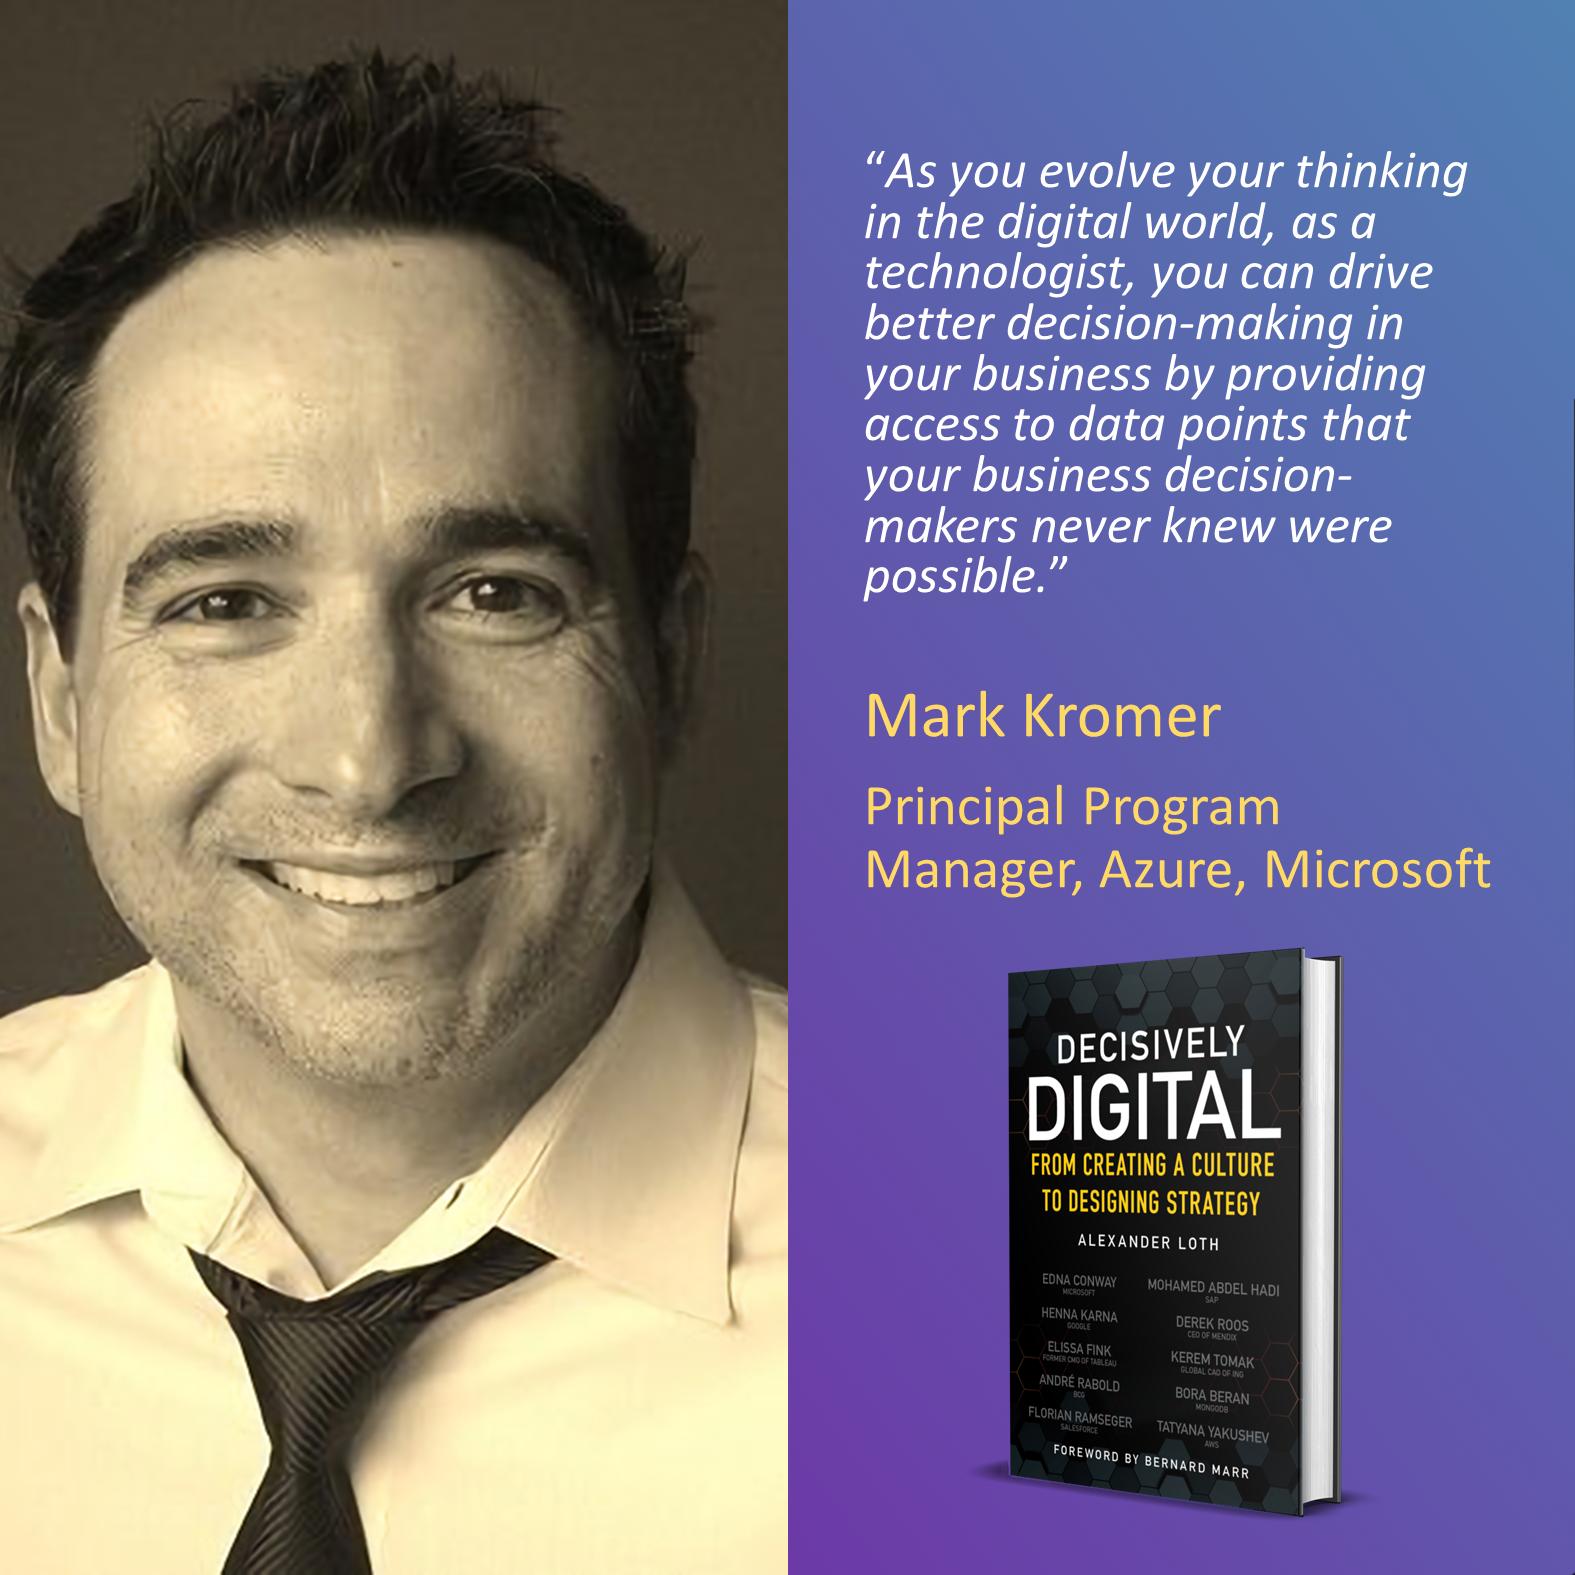 Mark Kromer, Microsoft